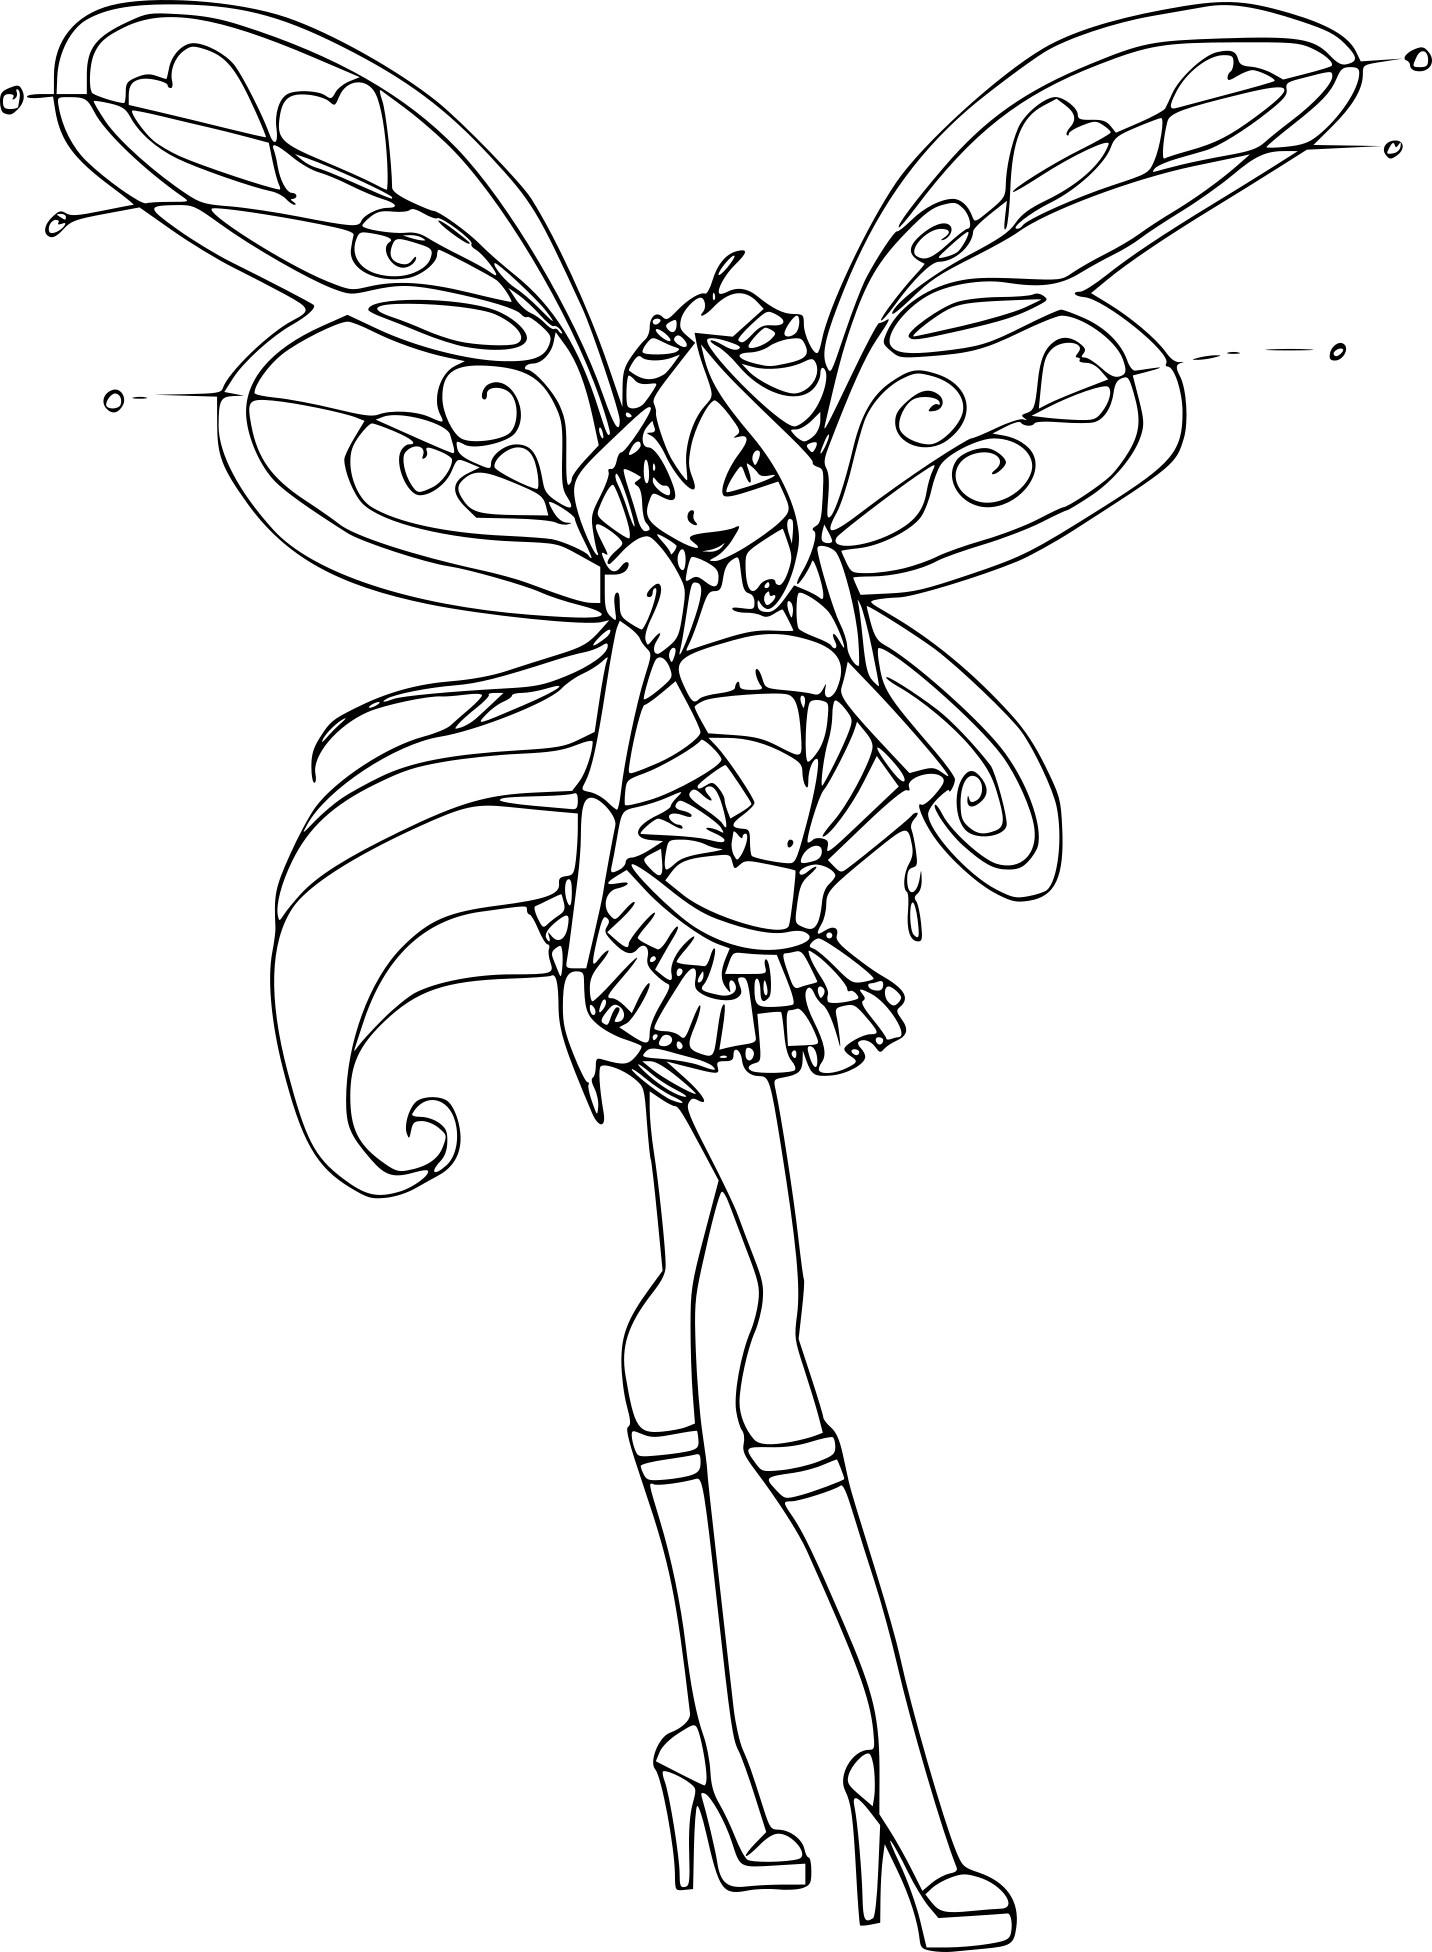 Luxe Dessin A Colorier Winx Bloom – Mademoiselleosaki destiné Coloriage De Winx Club